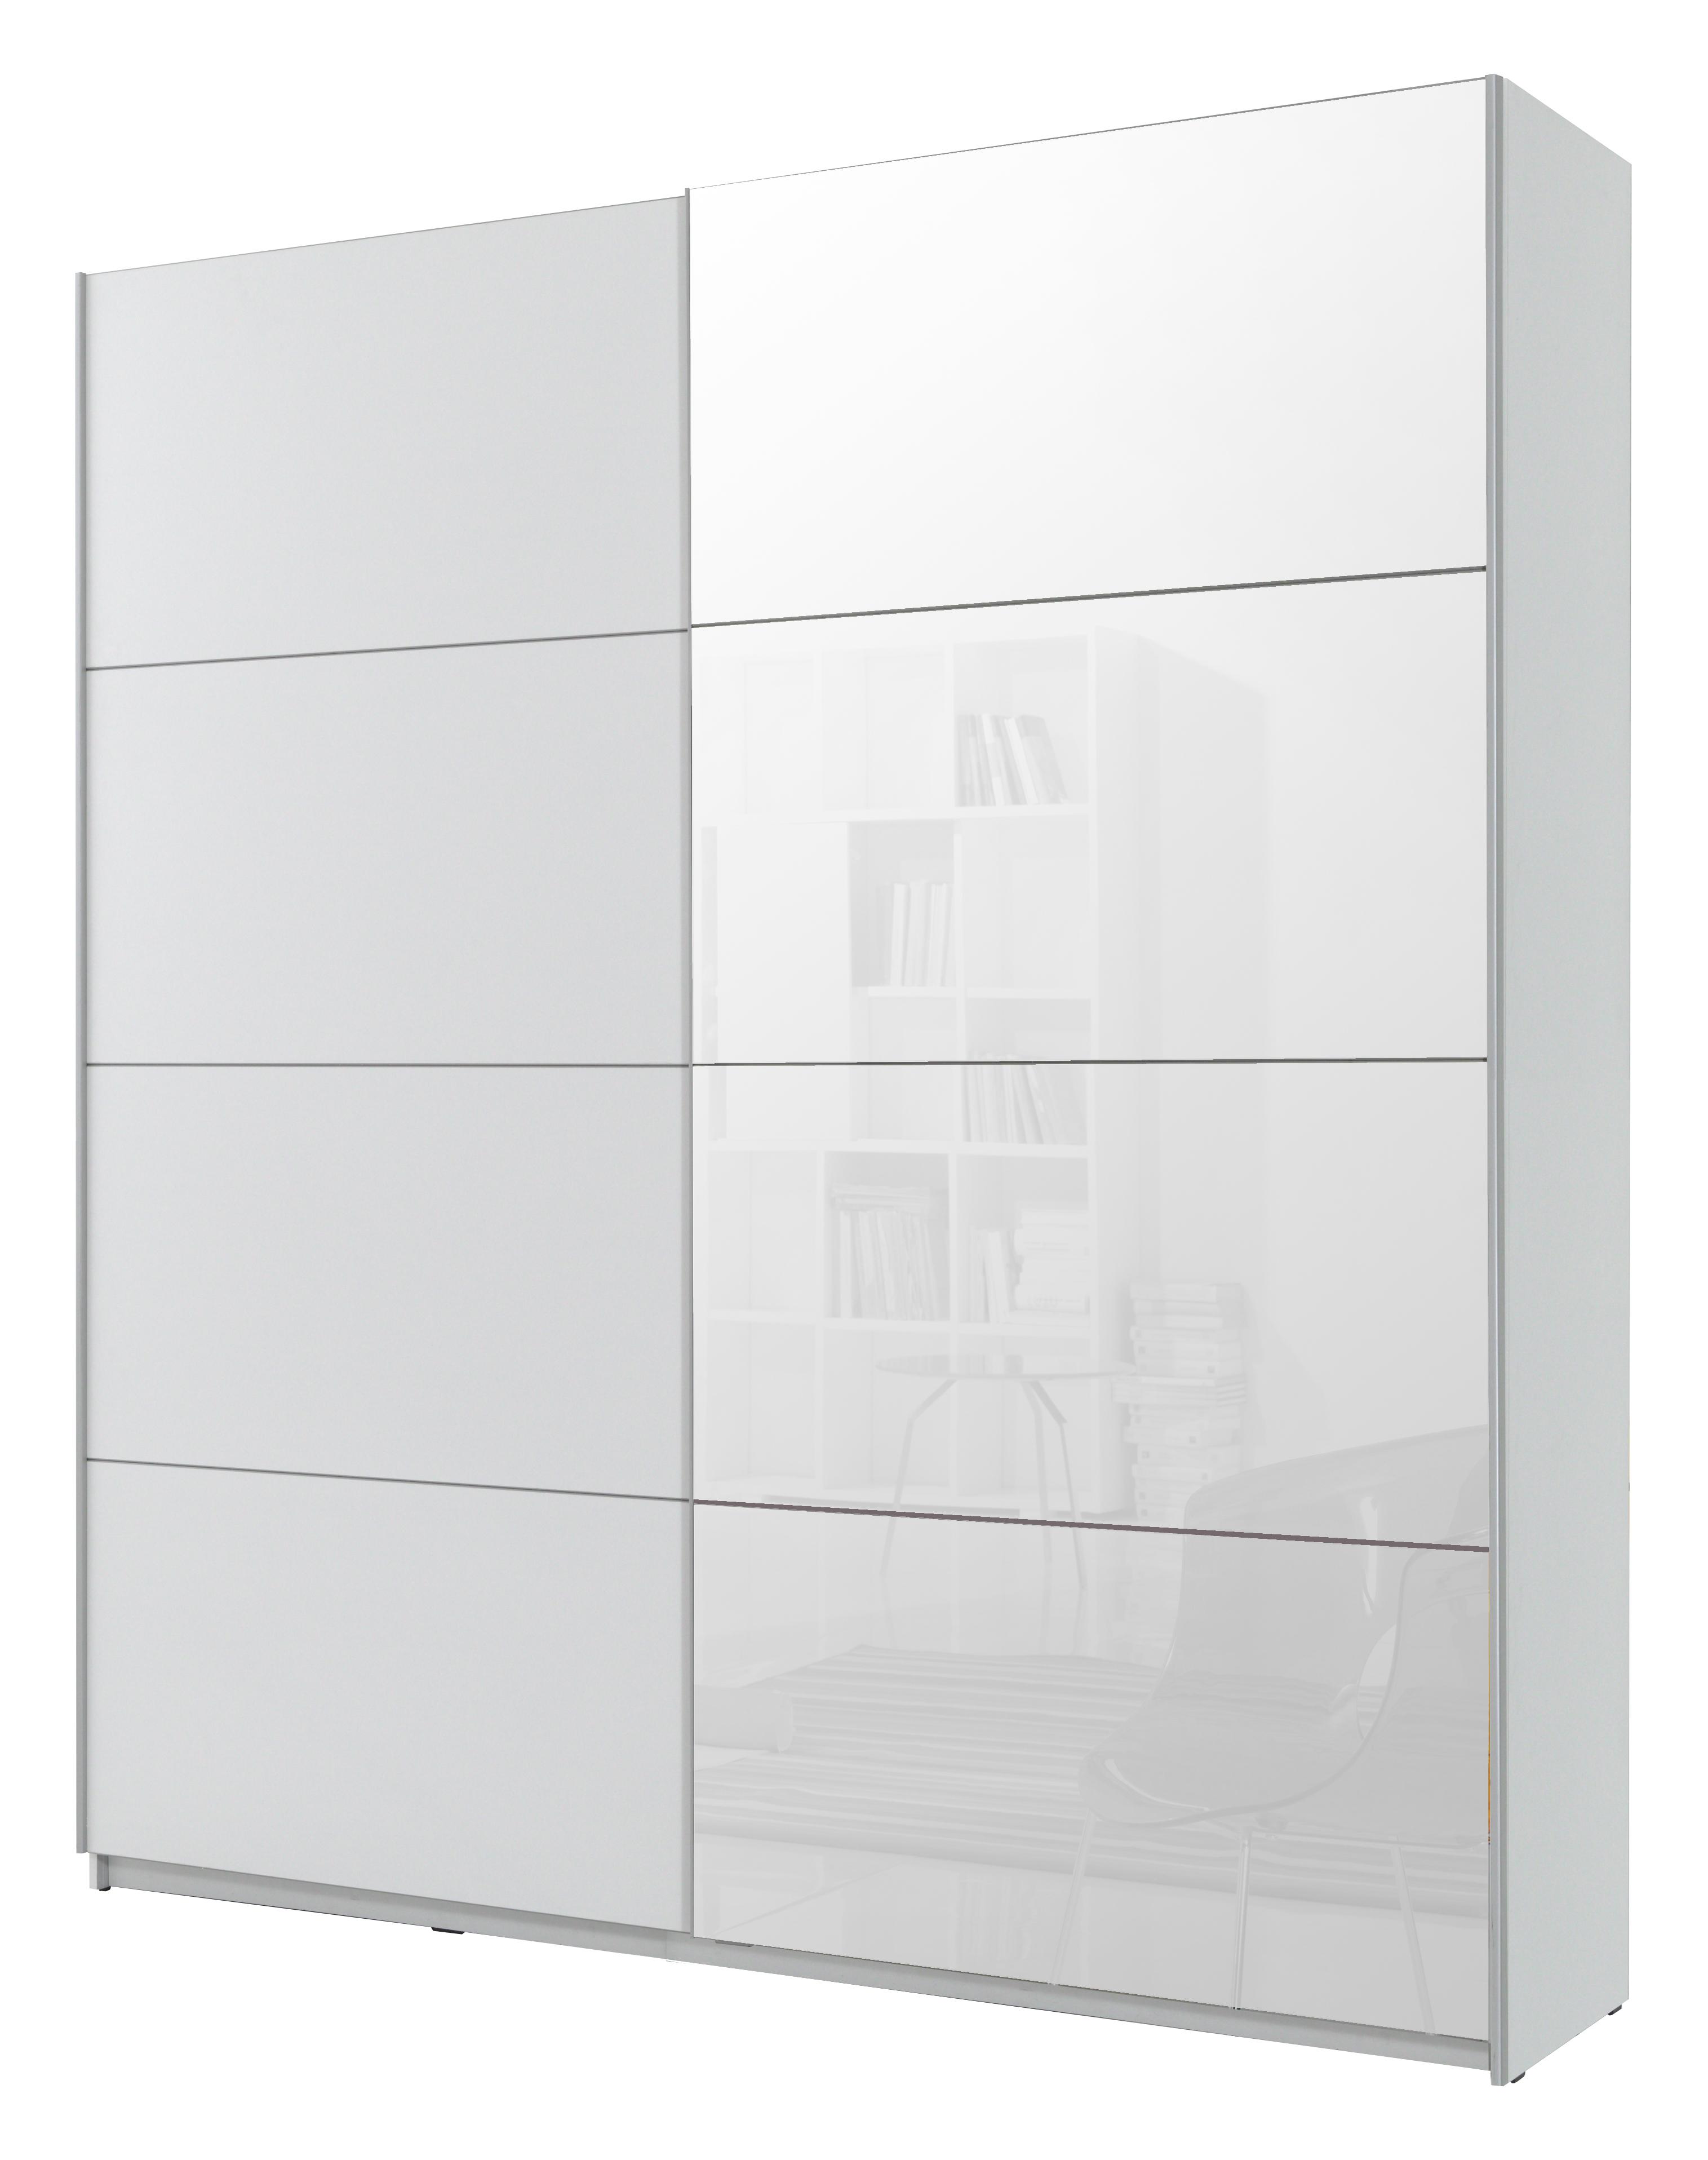 Šatní skříň - Benson - Typ 56 (bílá + zrcadlo)